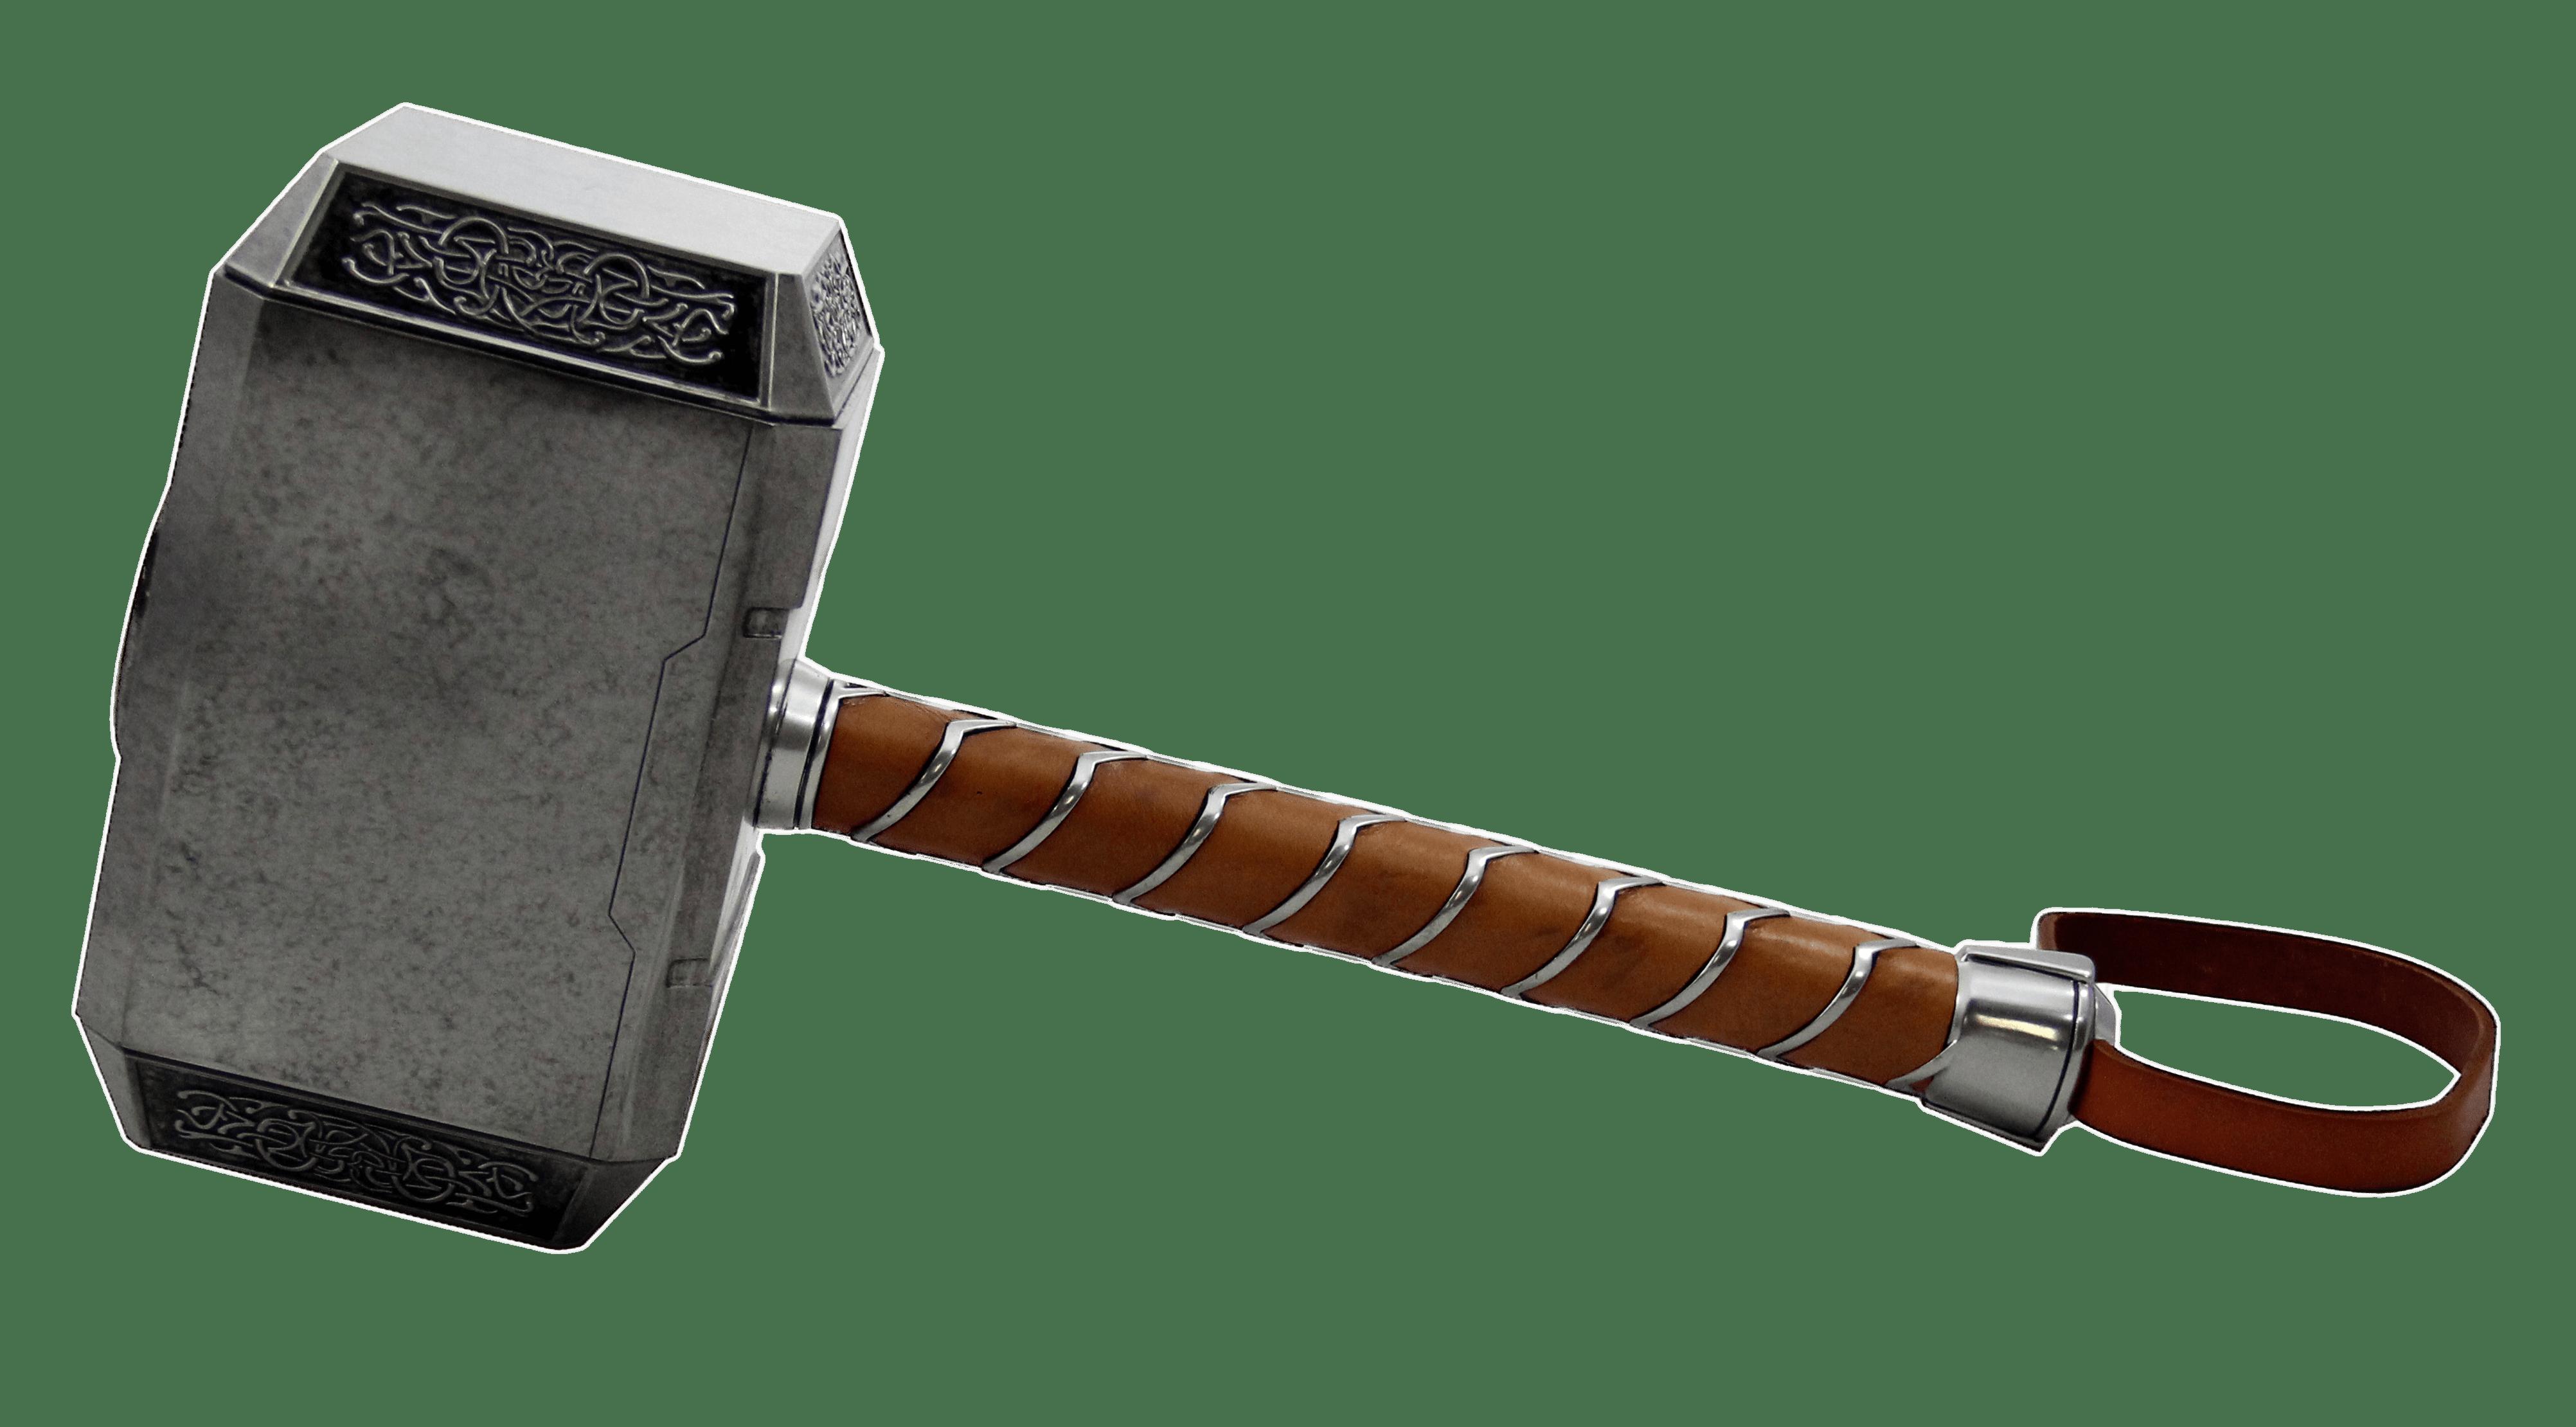 Hammer clipart thor. Transparent png stickpng